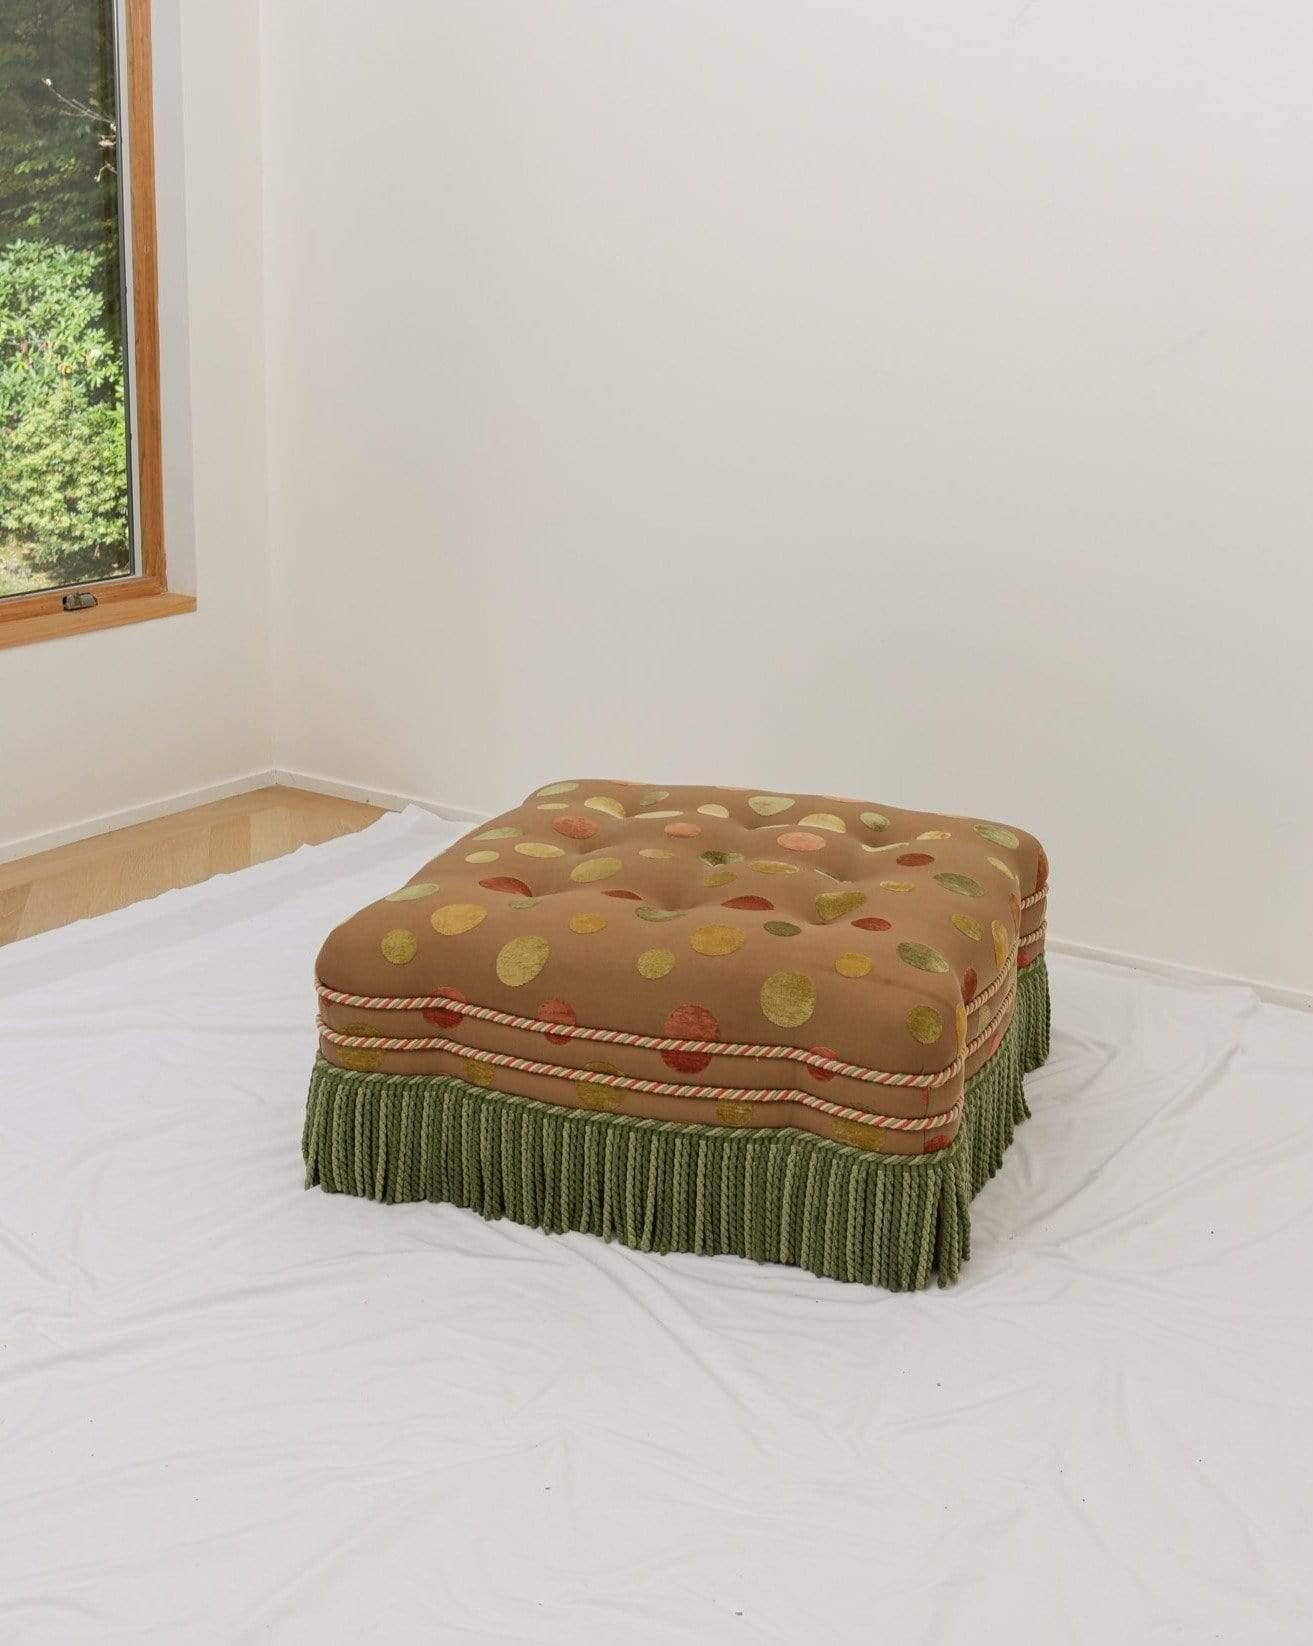 custom upholstered tufted ottoman with fringe detail